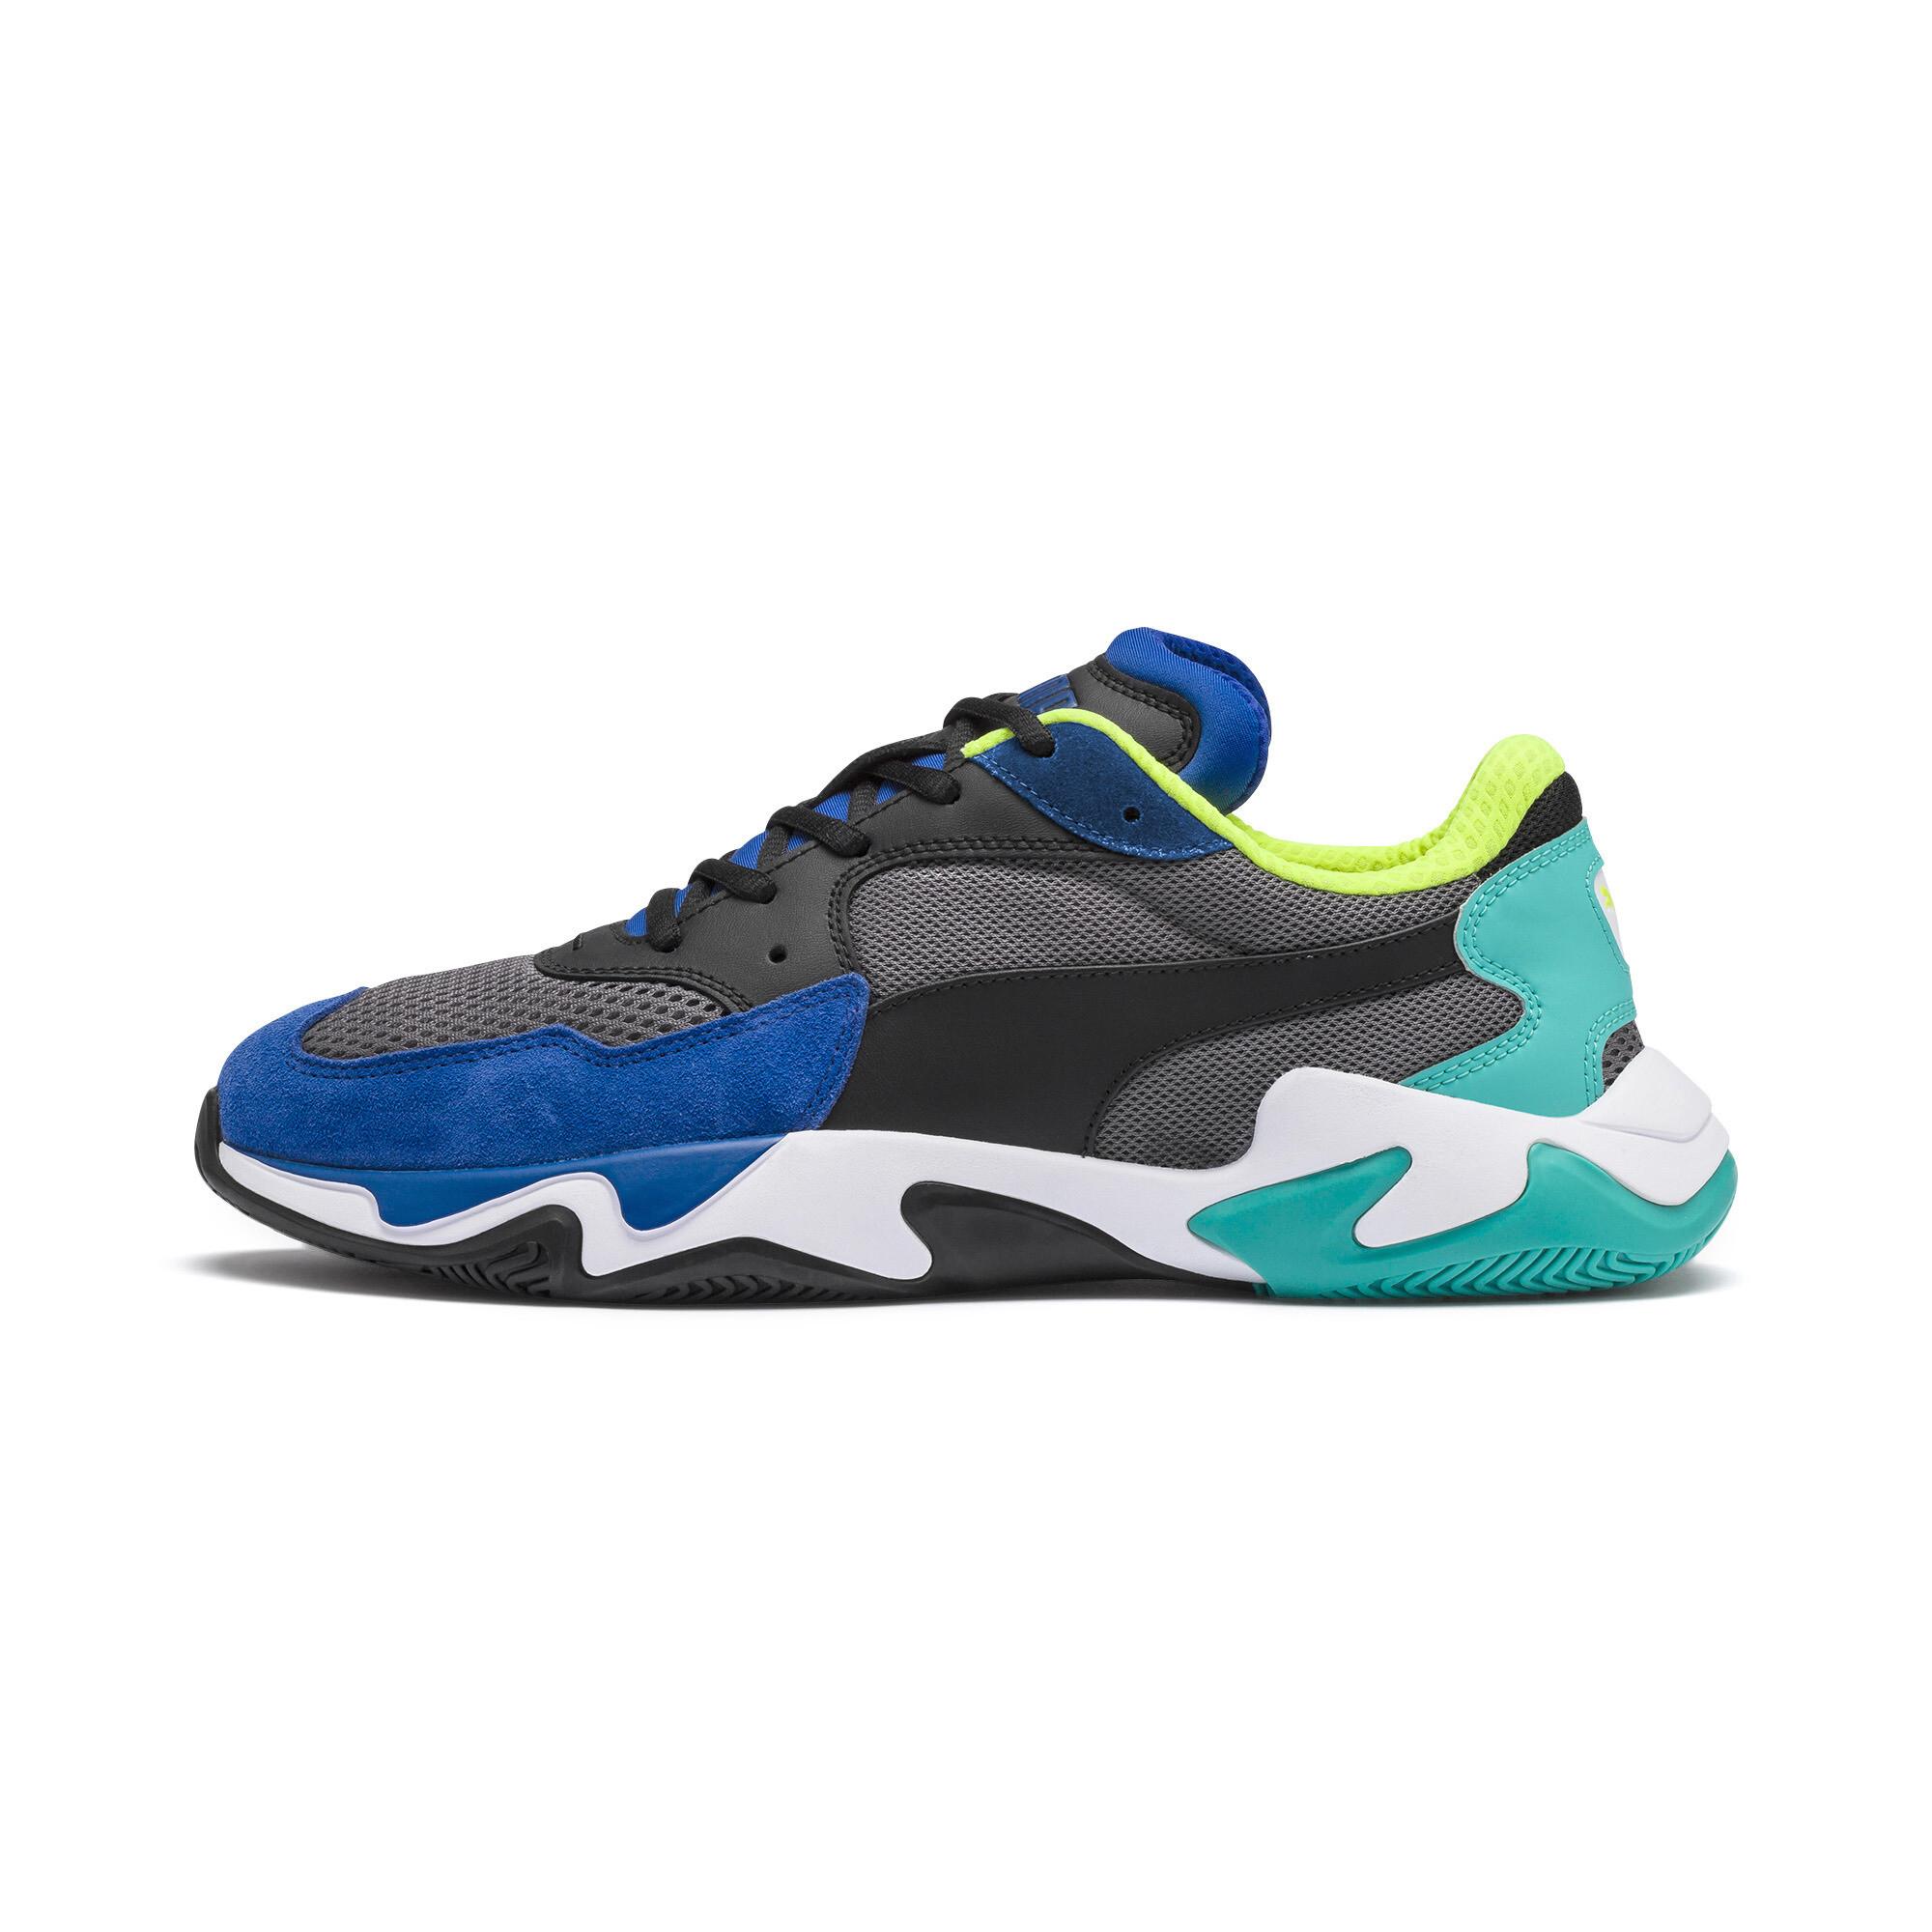 PUMA-Storm-Origin-Sneakers-Unisex-Shoe-Evolution thumbnail 11